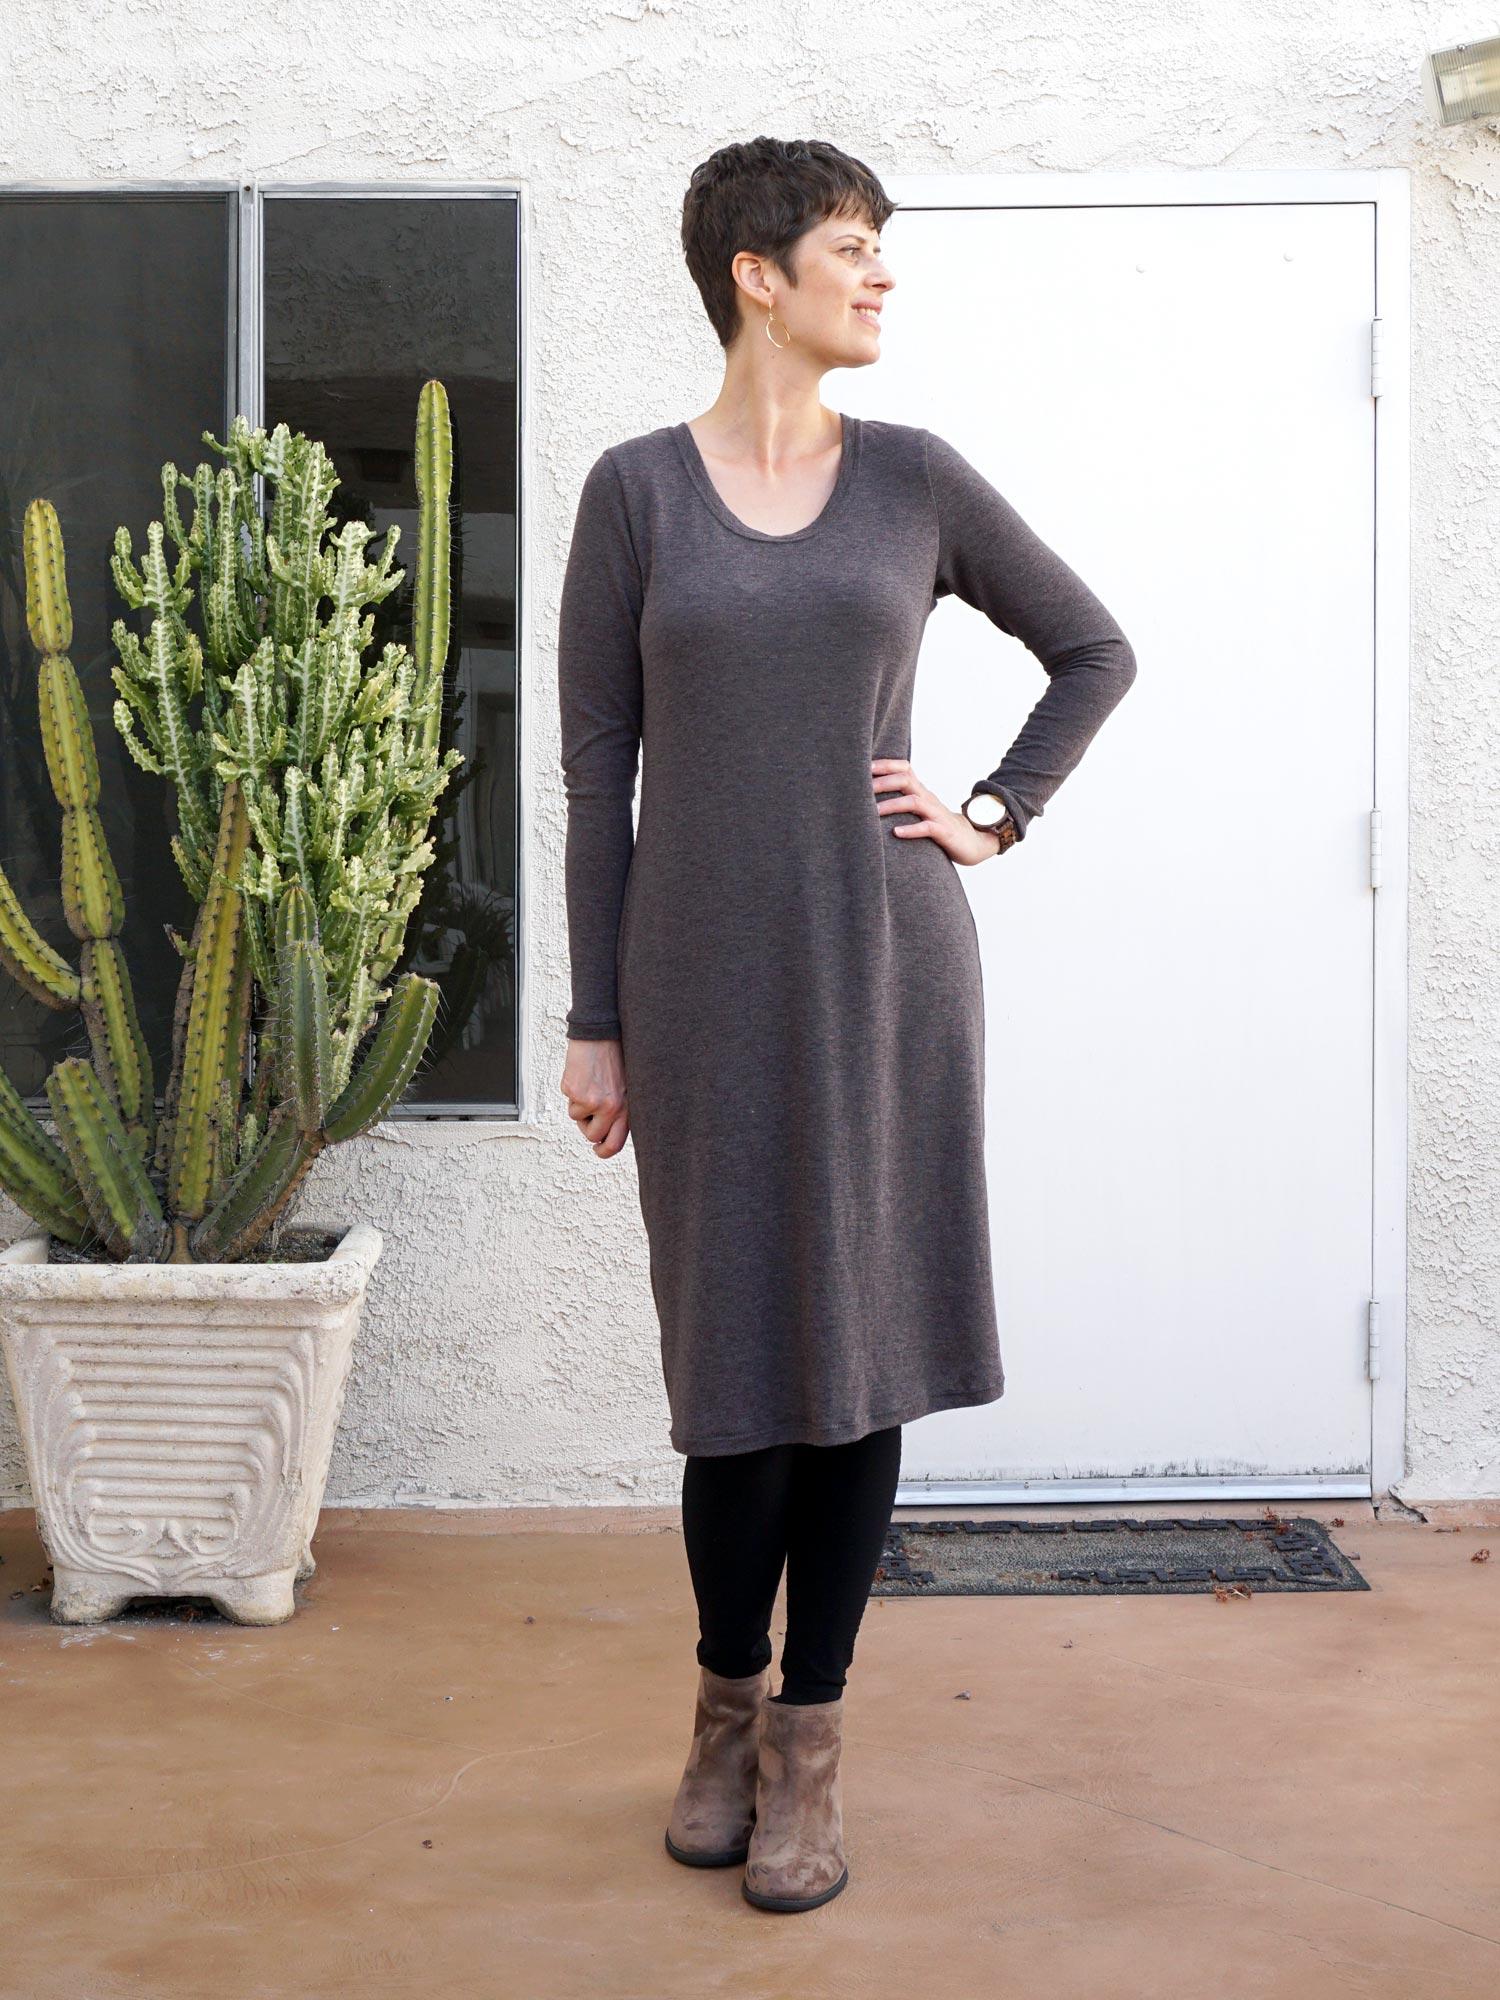 My DIY Travel Outfit – Neenah Dress   Sew DIY